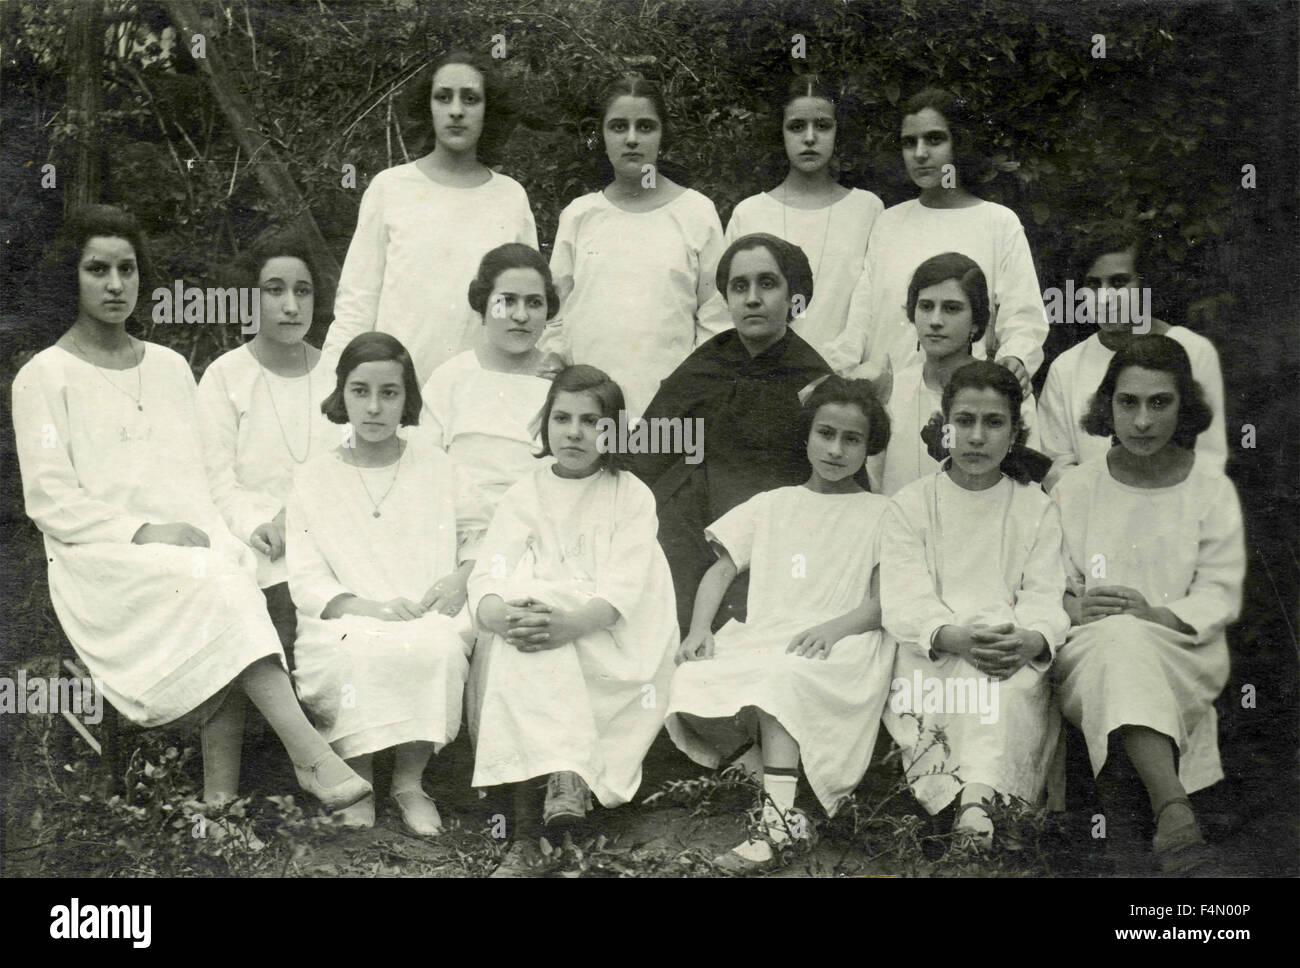 Retrato de un grupo de niñas vestidas de blanco, Italia Imagen De Stock